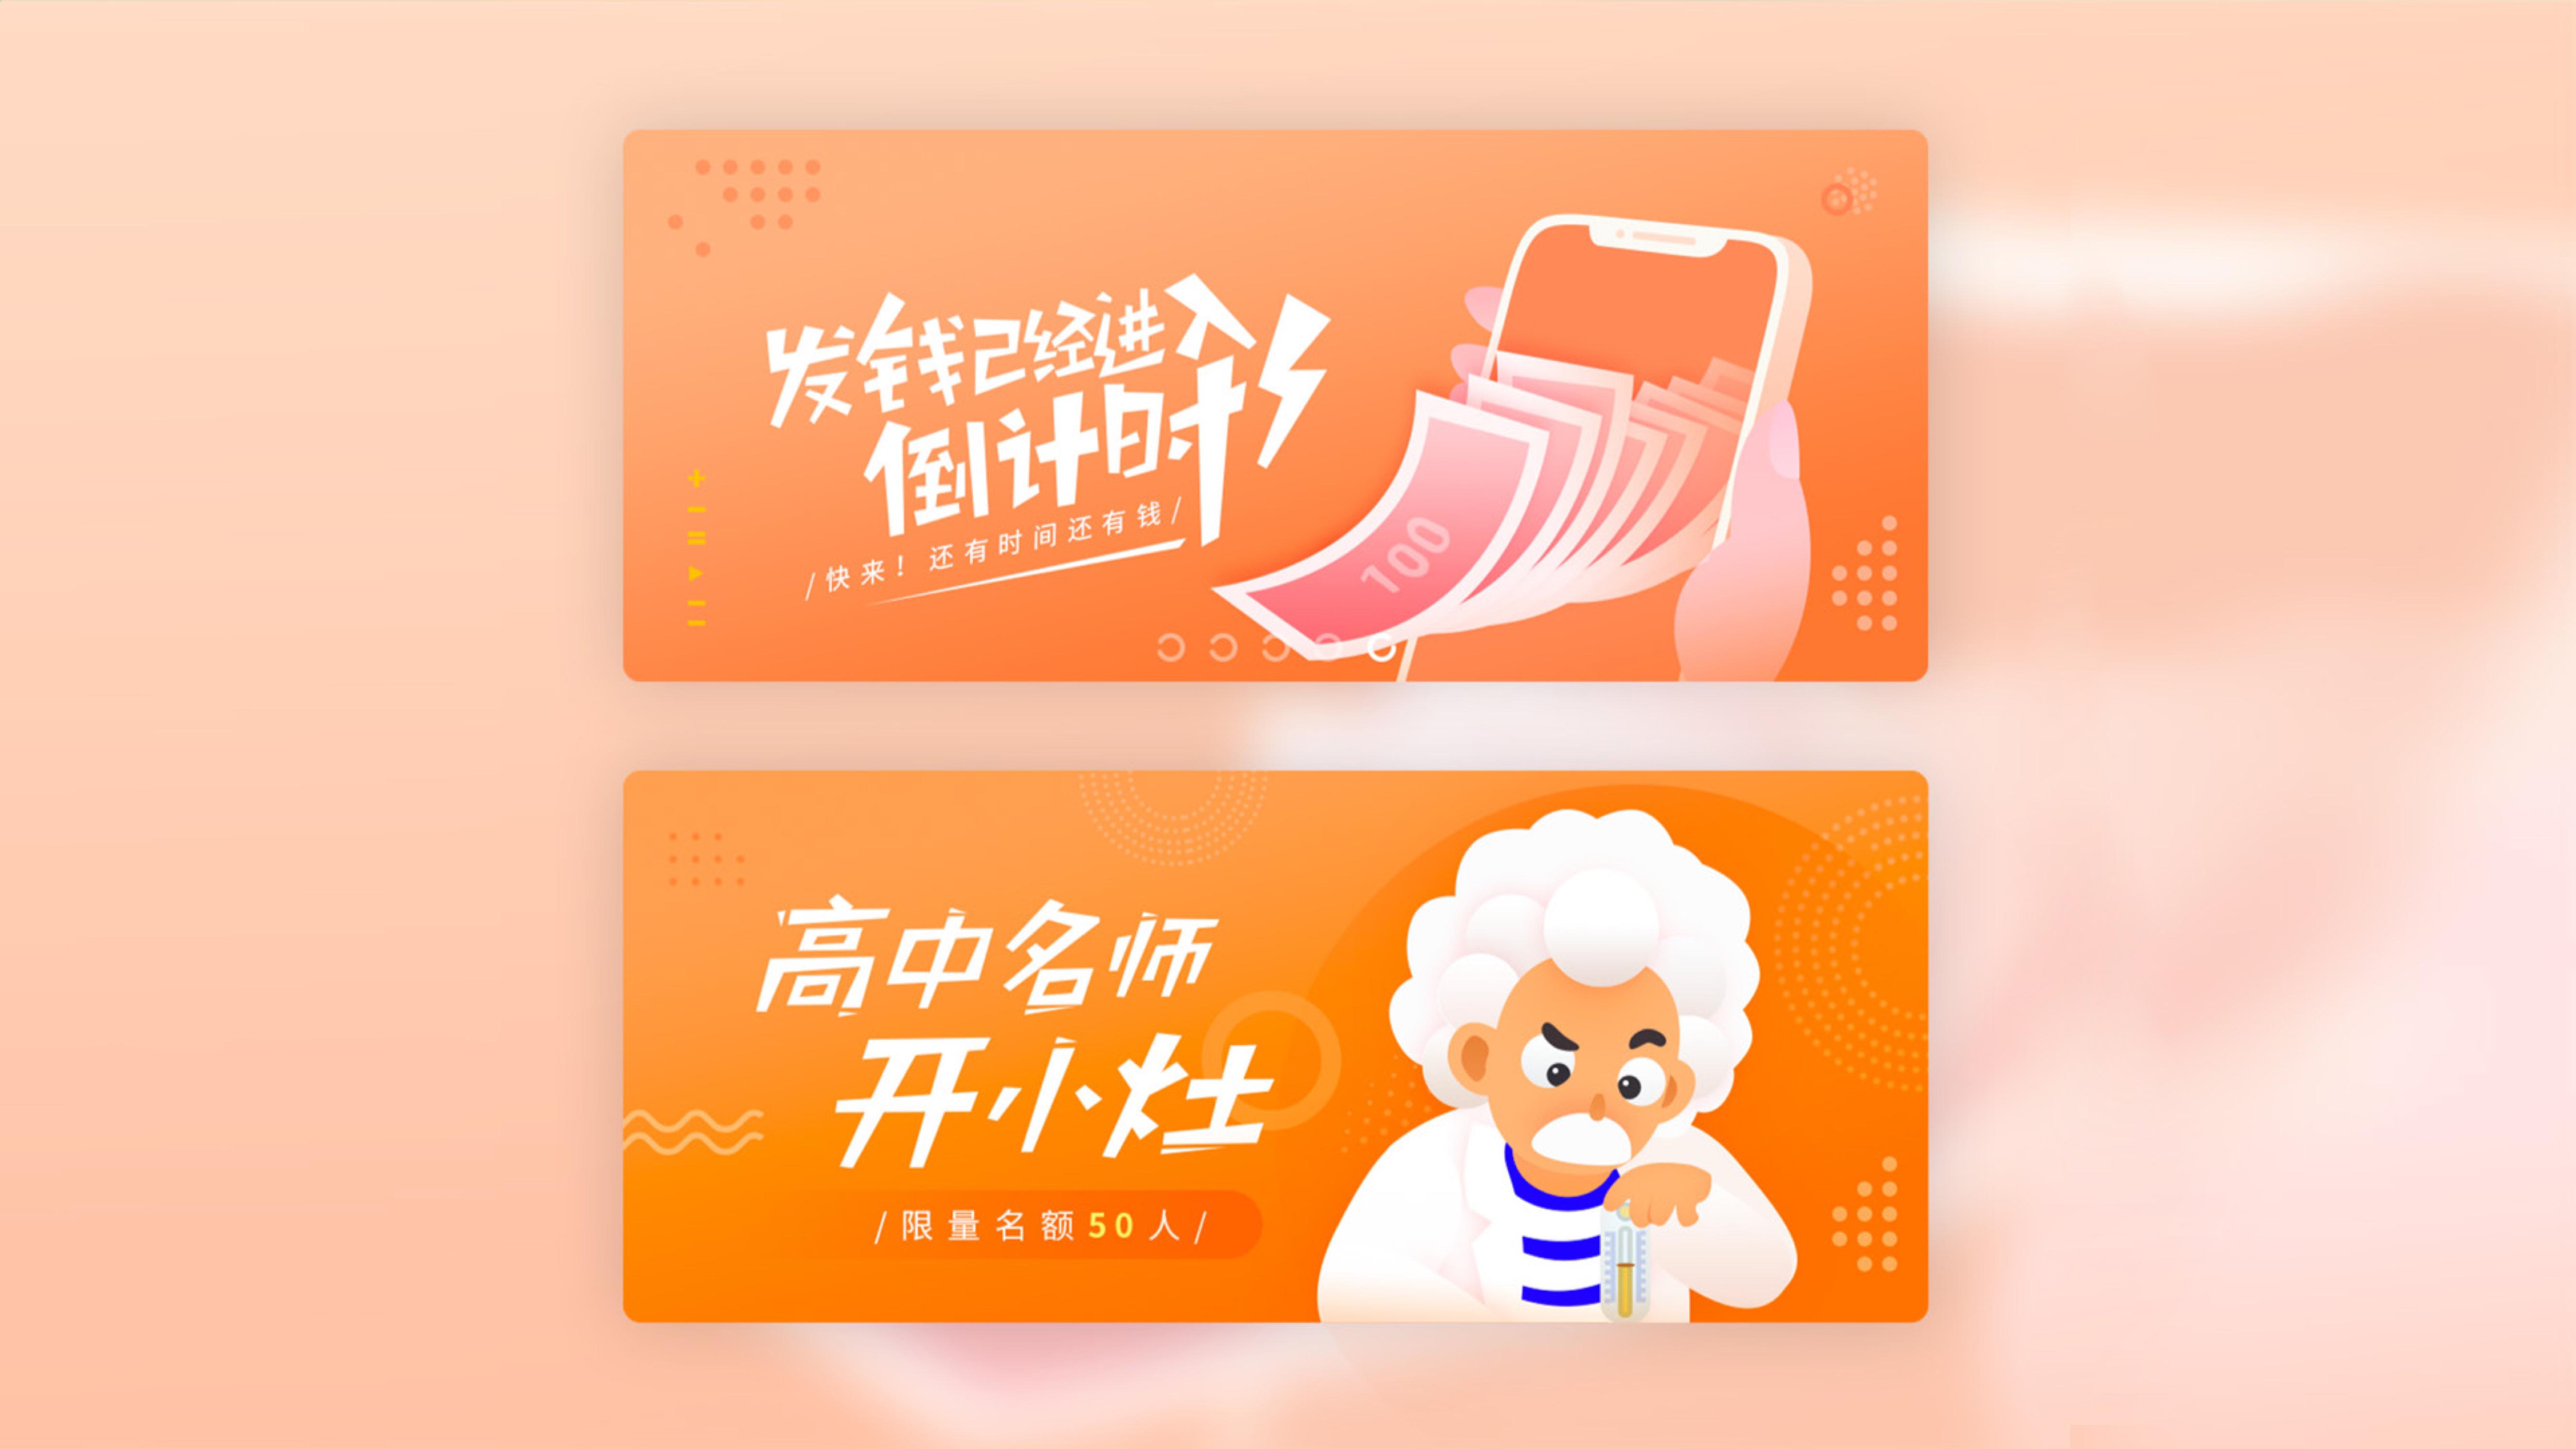 Ui设计师 程昊 17004957710 109 10 23 2019